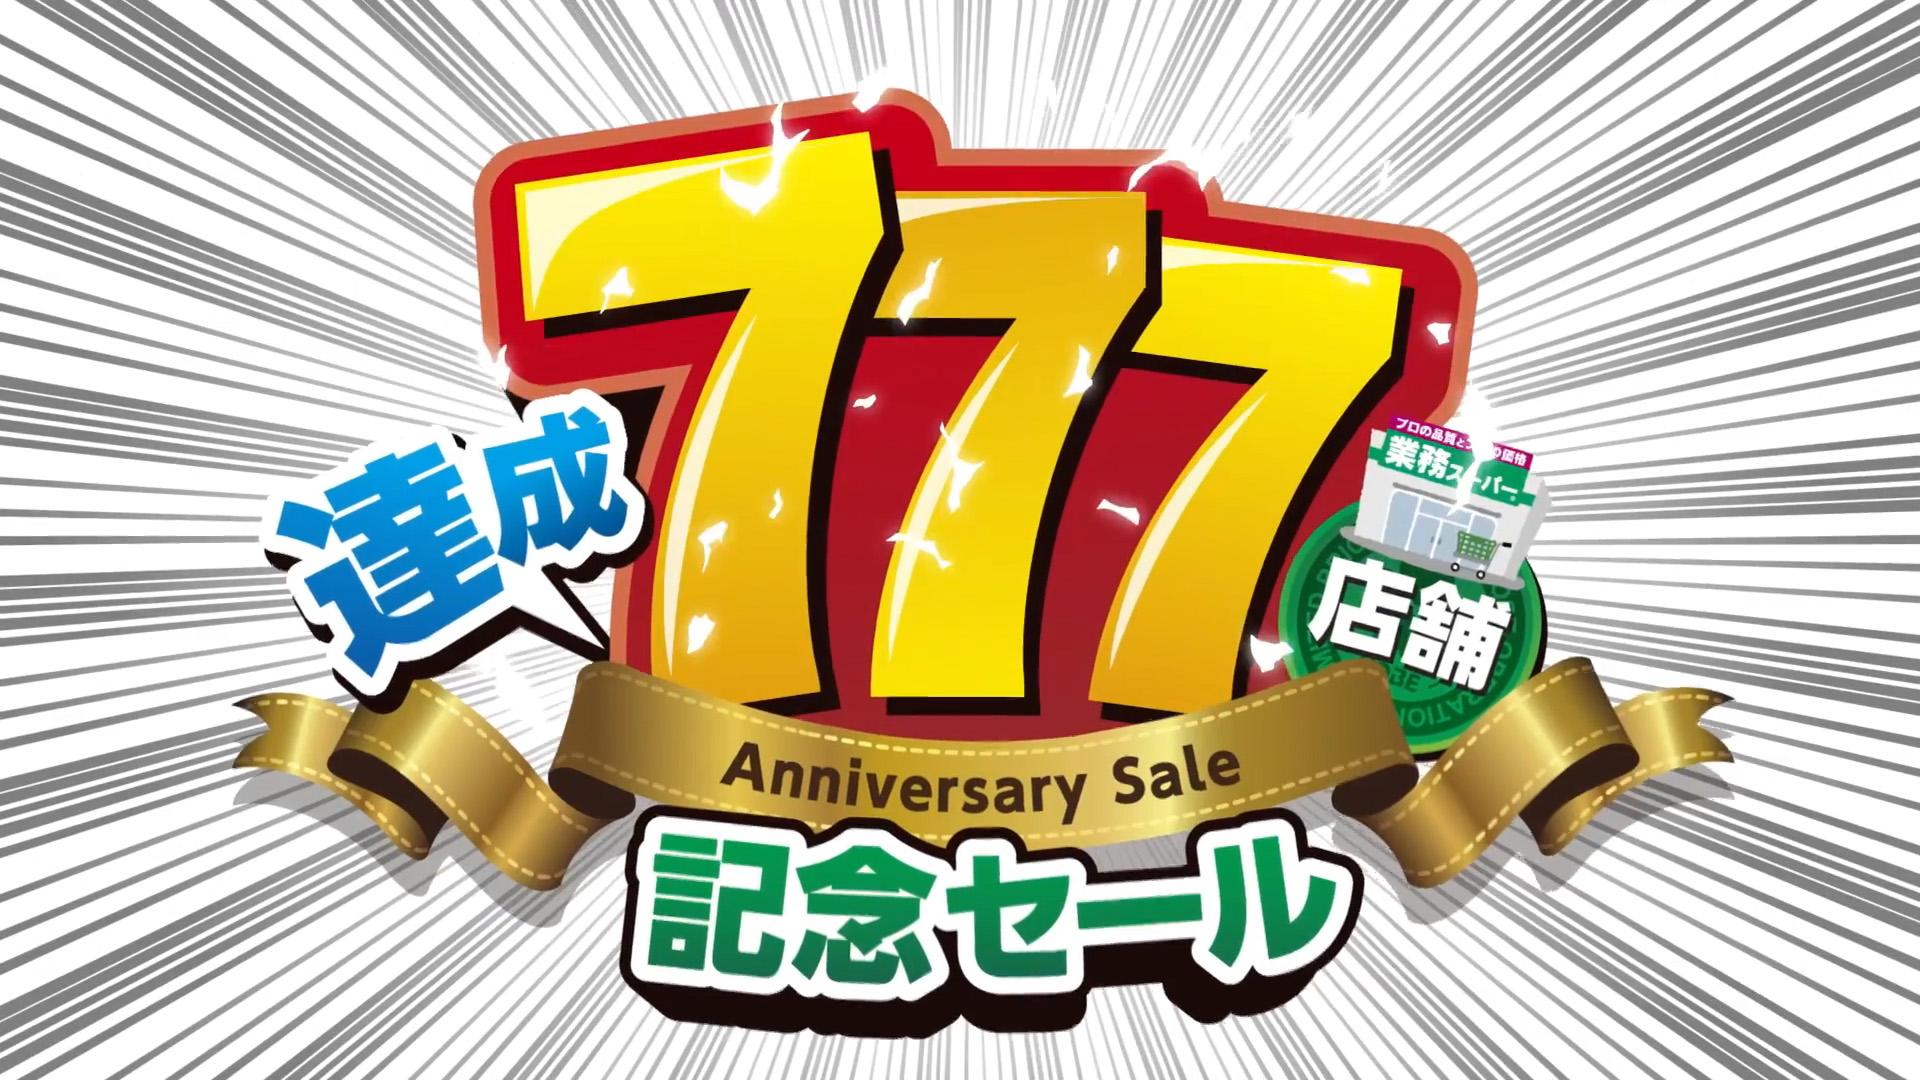 業務スーパーTVCM 第2弾